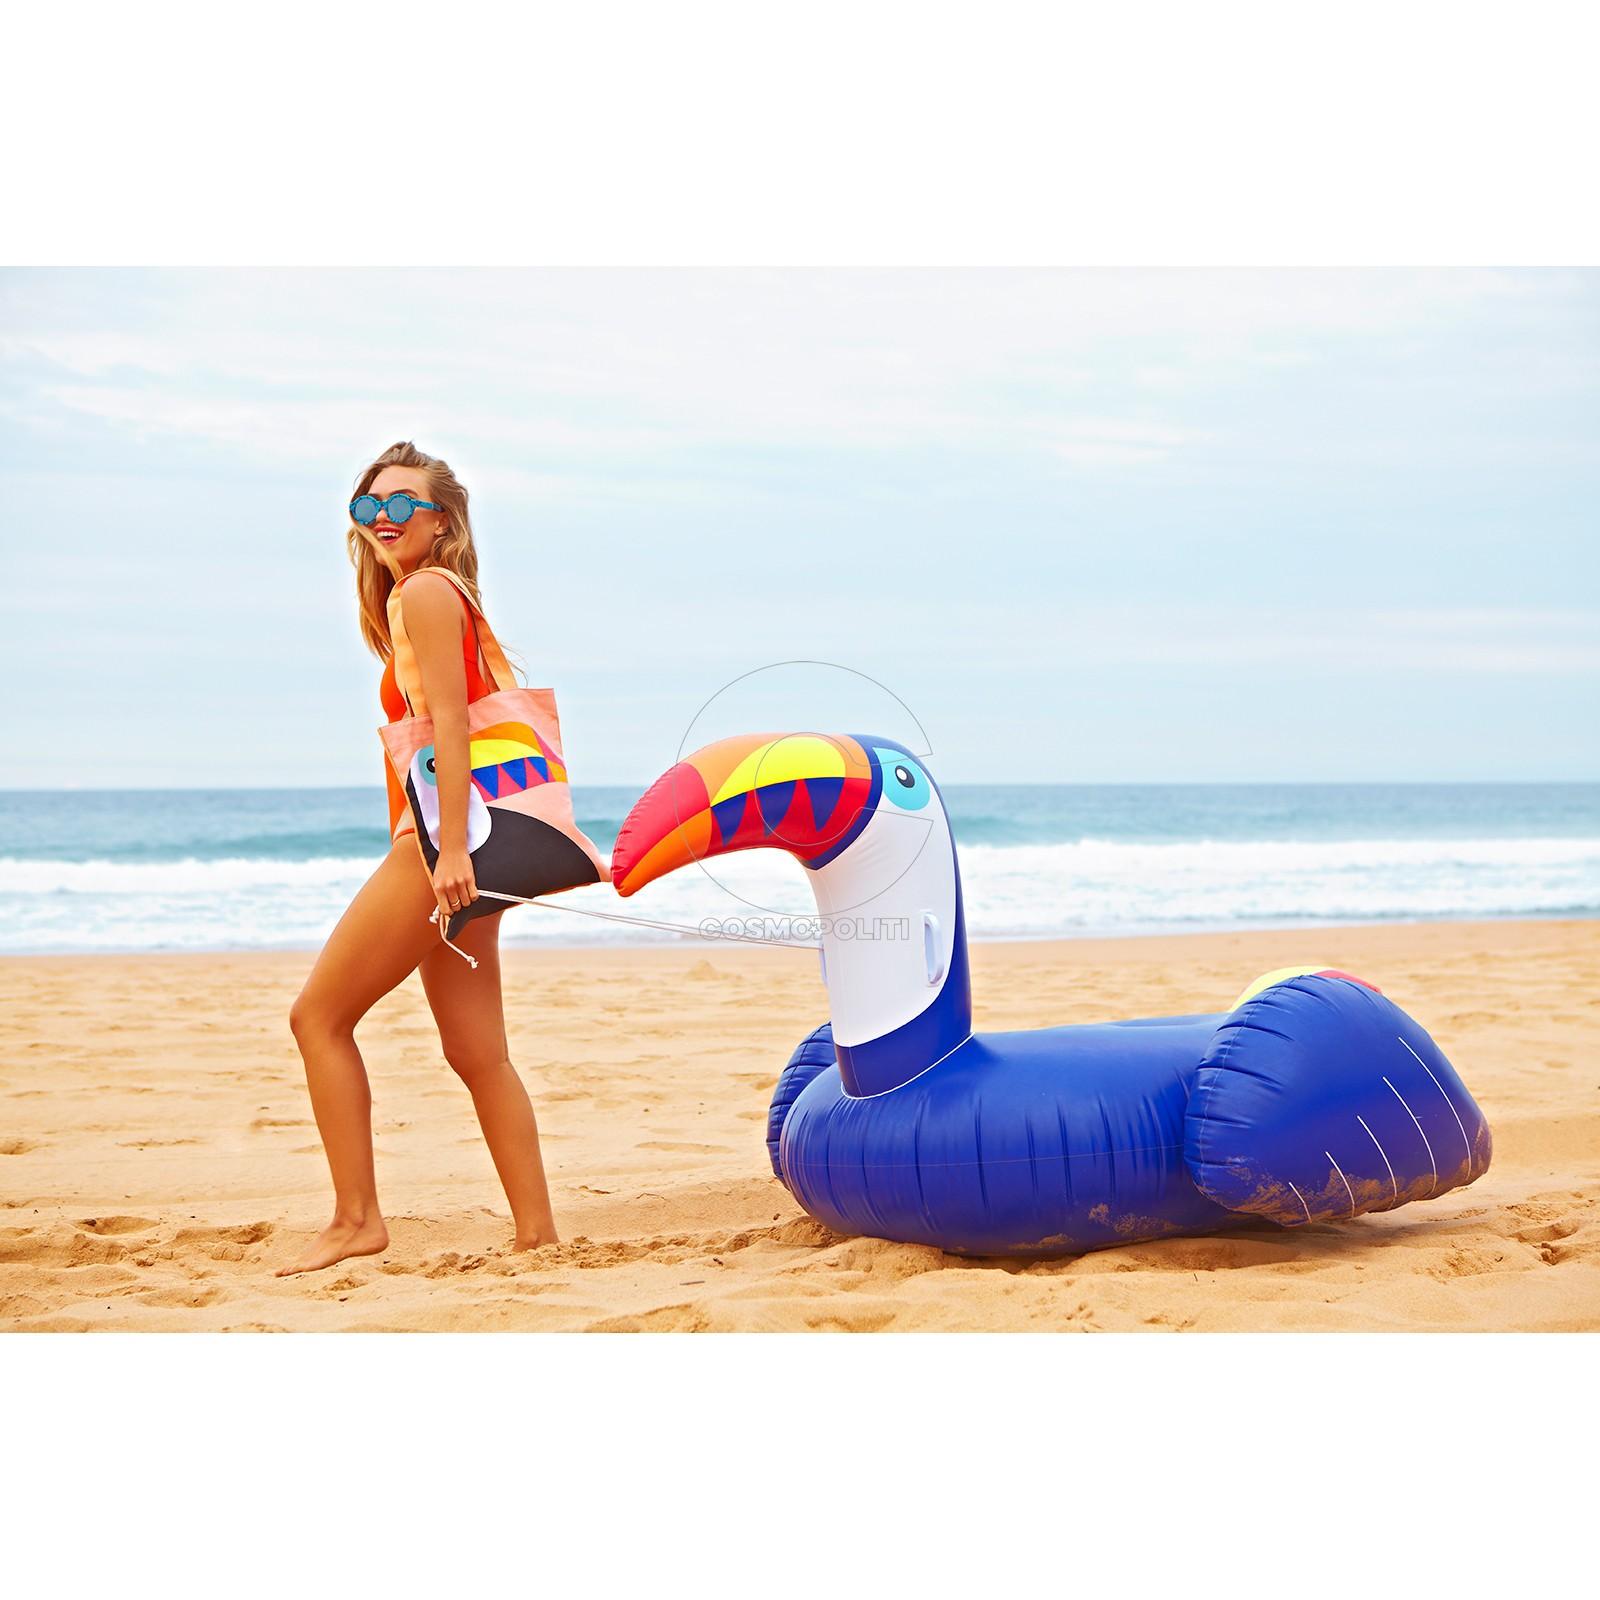 sunofabeach_luxe-float-toucan_5B4_5D